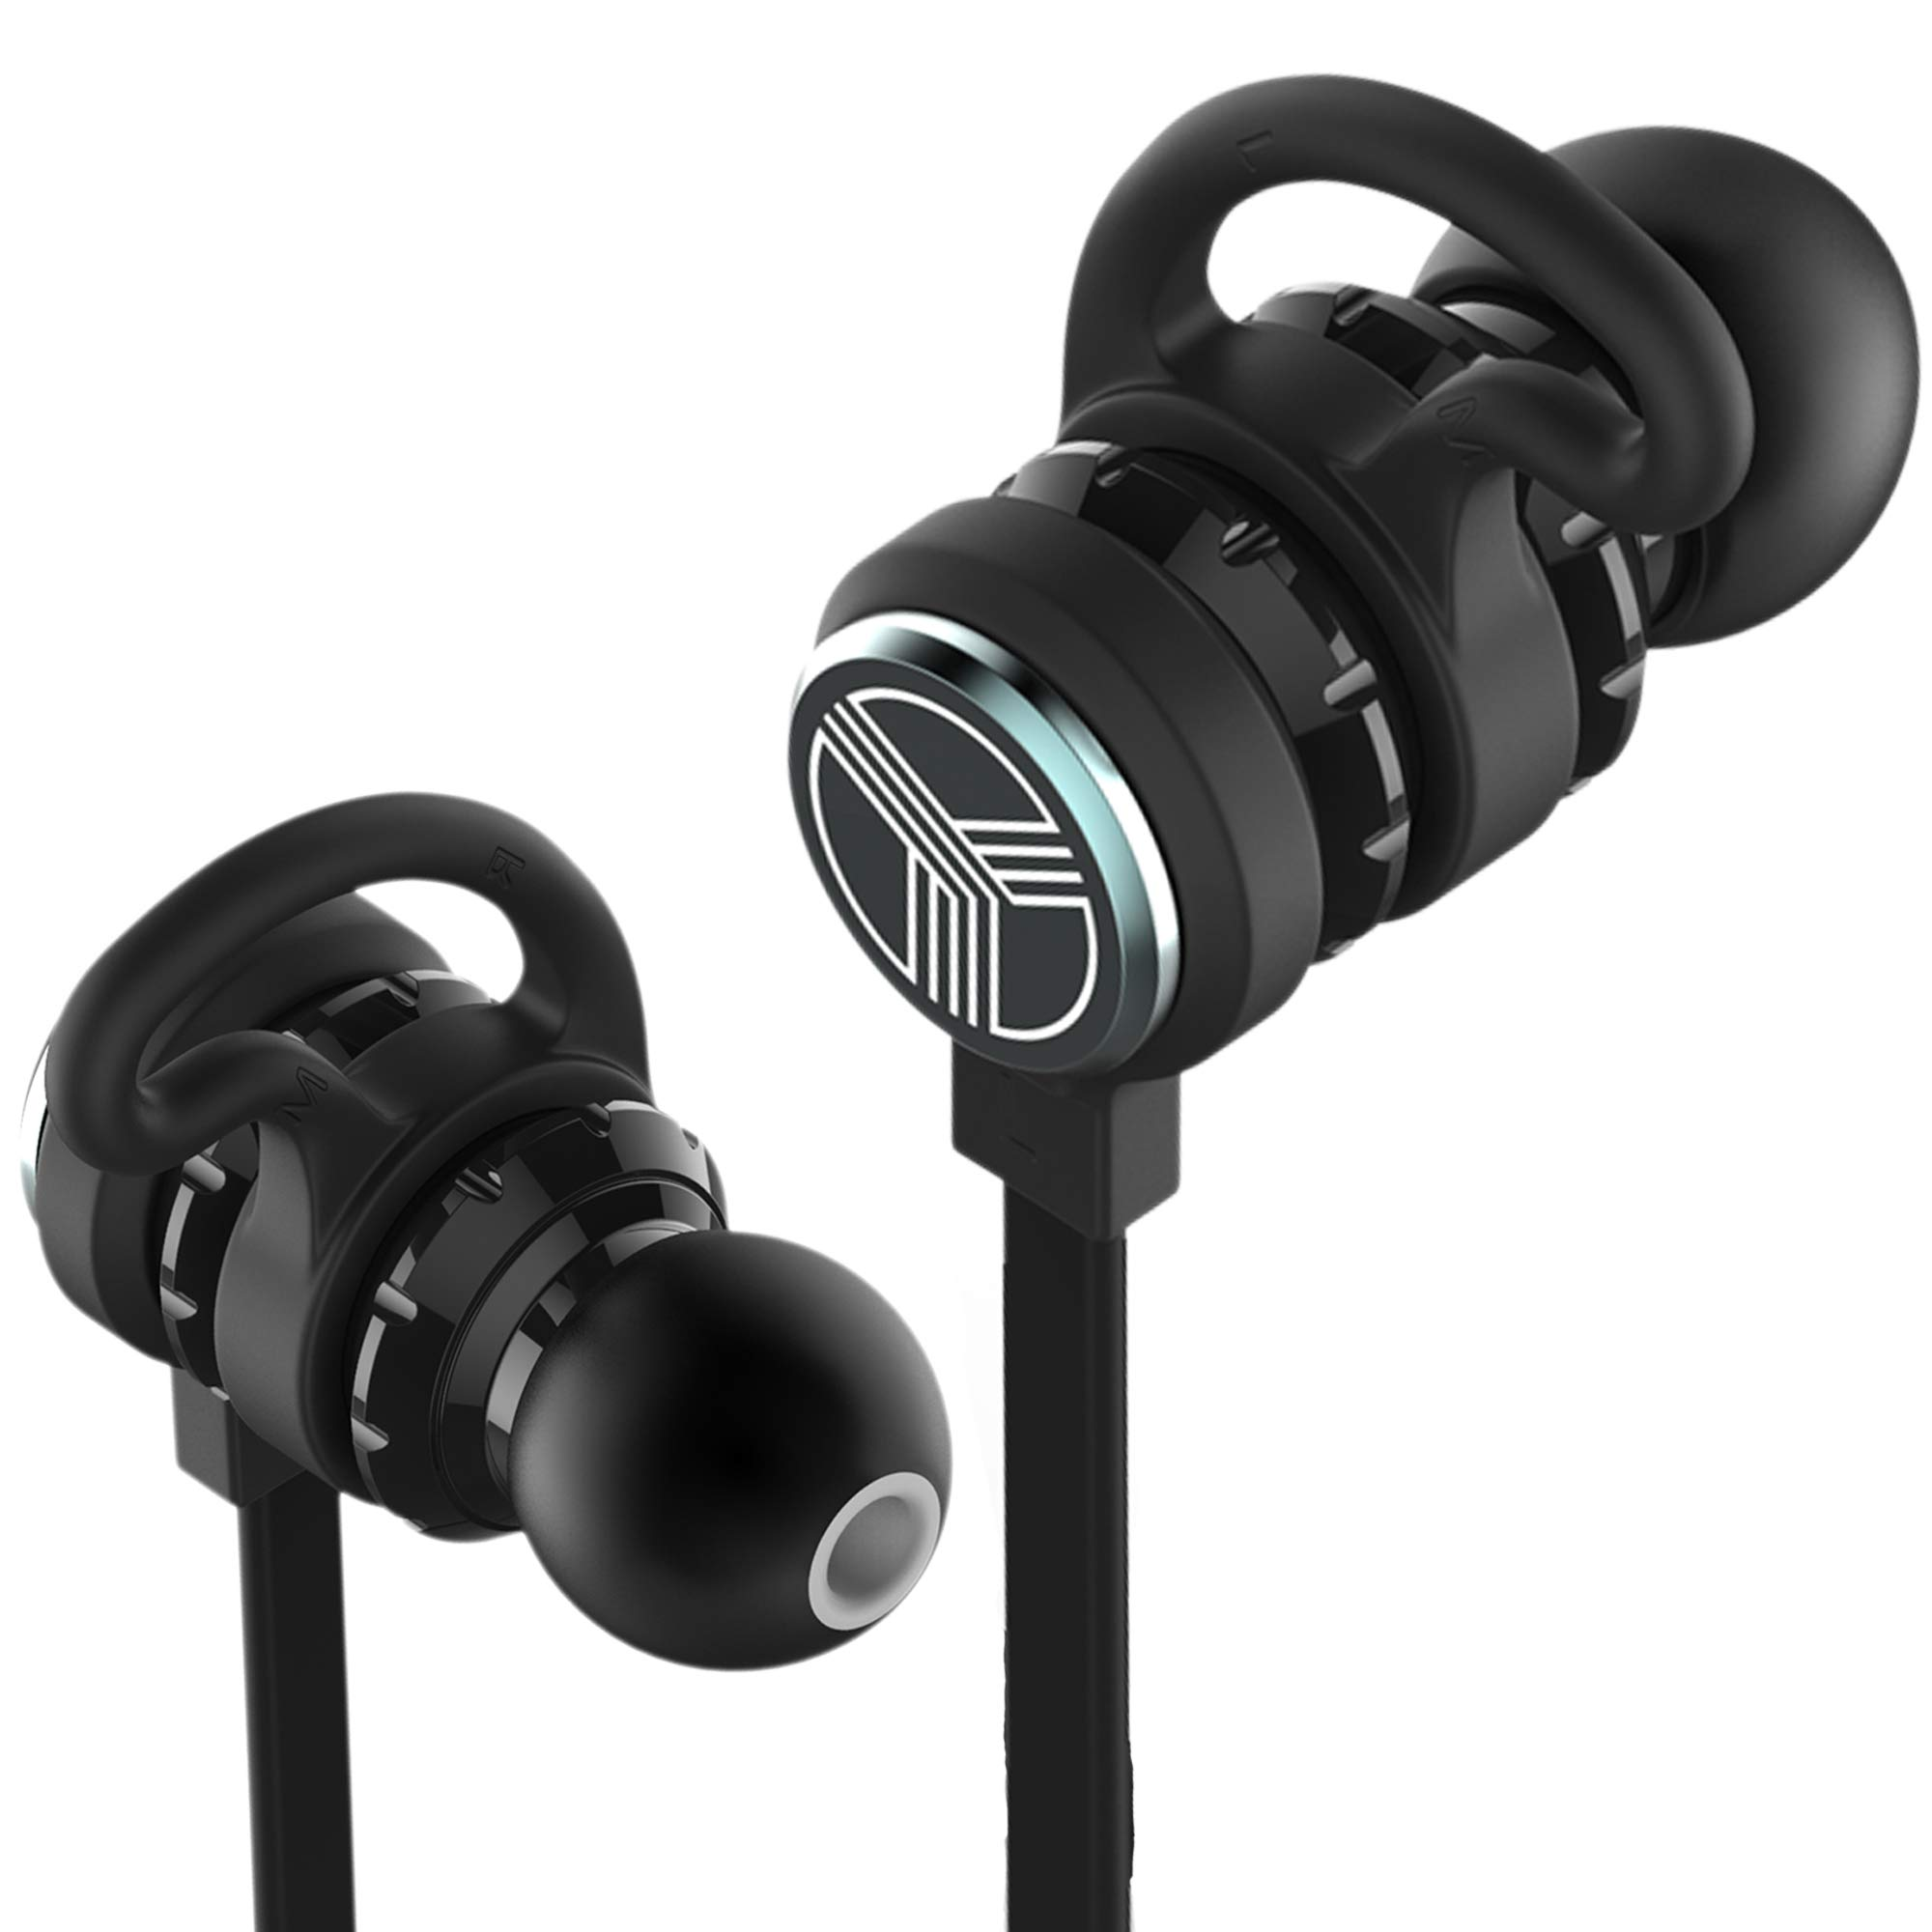 TREBLAB J1 - Elite Wireless Running Earphones - Hyper-HD aptX Stereo Sound Magnetiс Earbuds. IPX6 Waterproof, Microphone, Noise Cancelling Best Bluetooth Sport Headphones. Wireless Headphones for Gym by Treblab